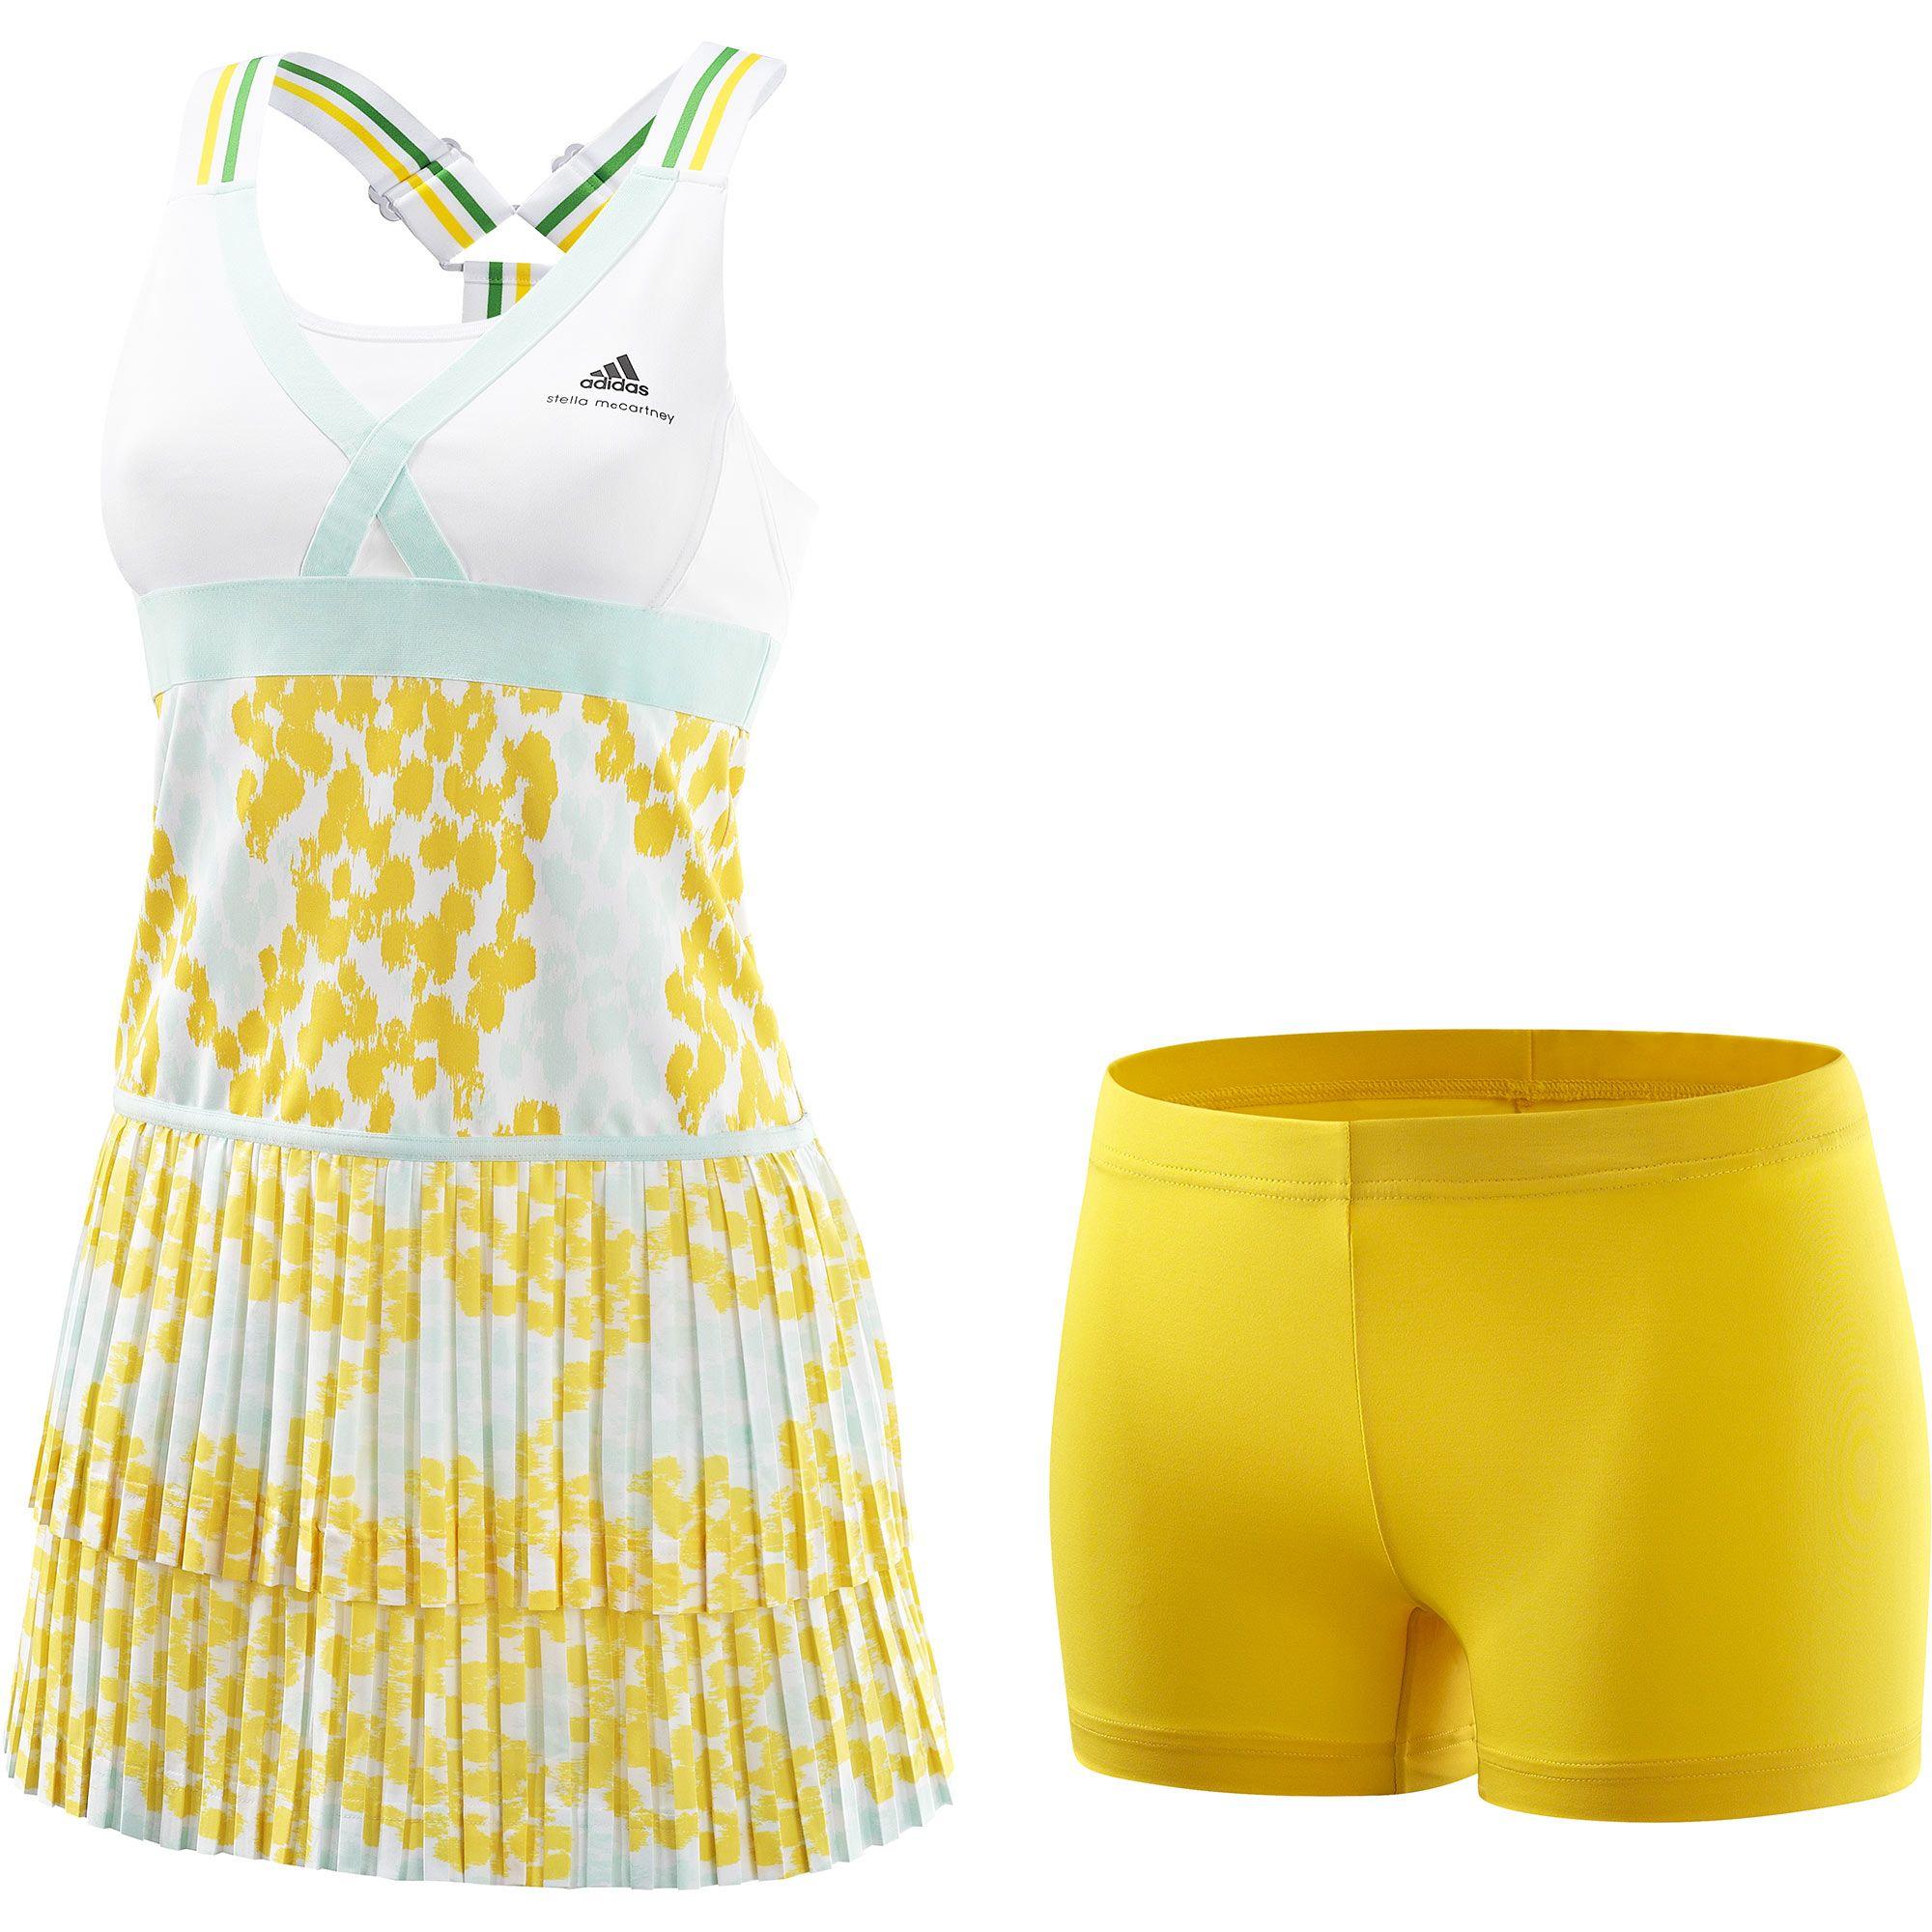 adidas robe tennis,adidas Melbourne Line Robe Femmes Bleu